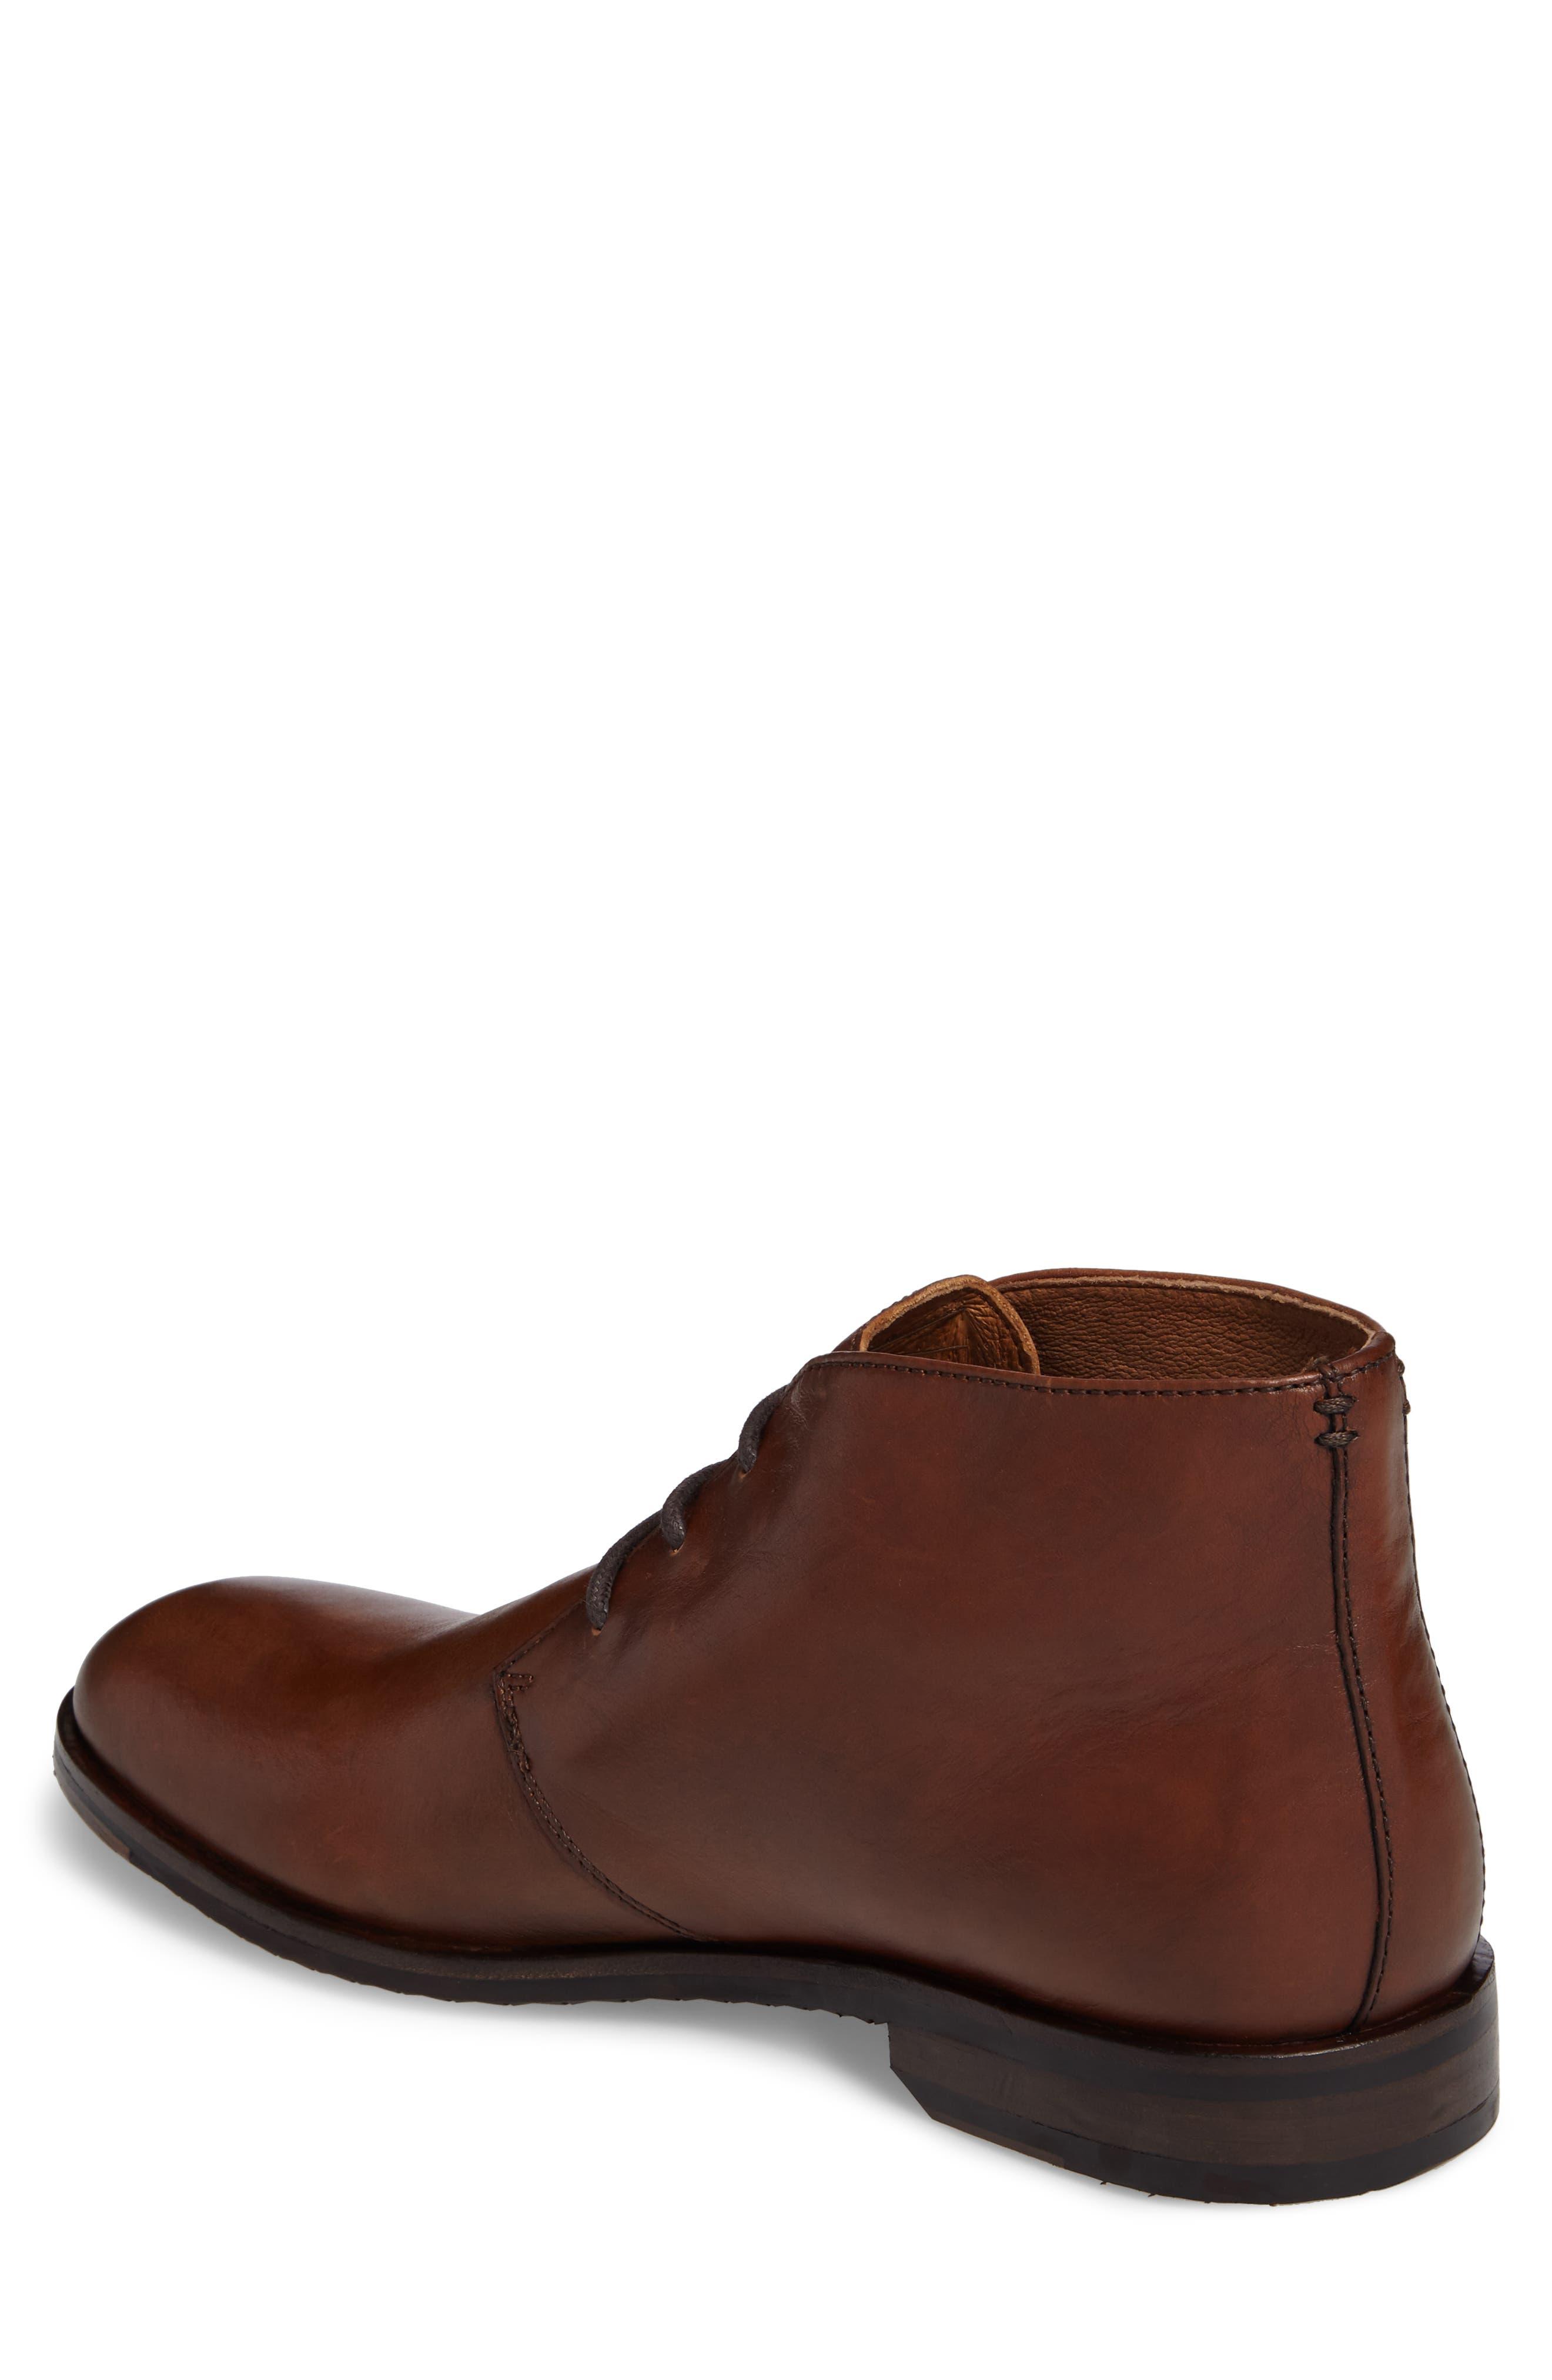 Sam Chukka Boot,                             Alternate thumbnail 2, color,                             Cognac Leather